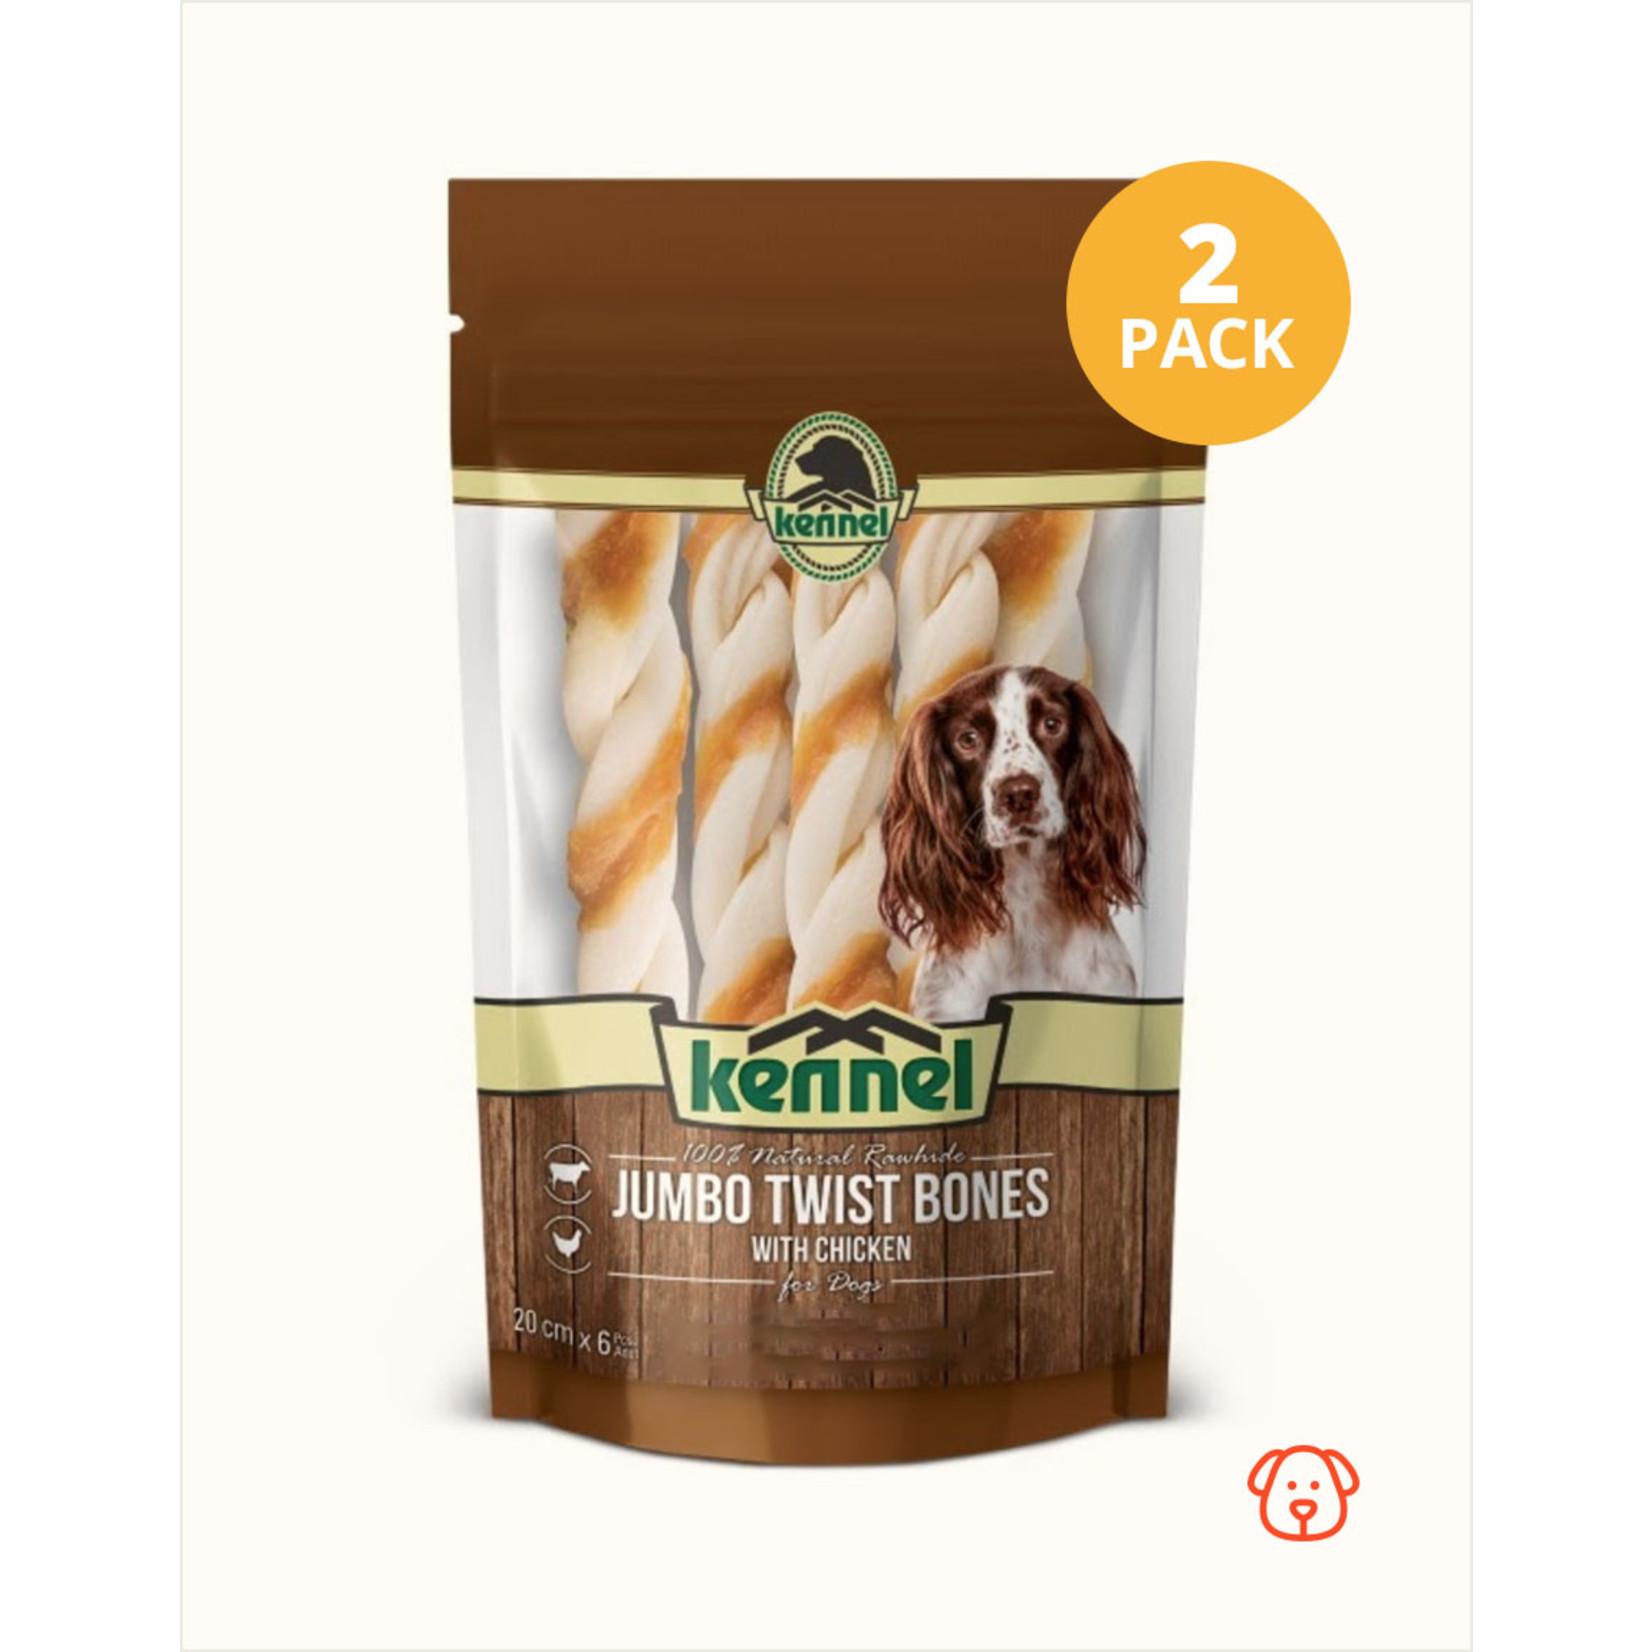 Kennel Kennel Chewing Bones Jumbo Twist   2 Pack